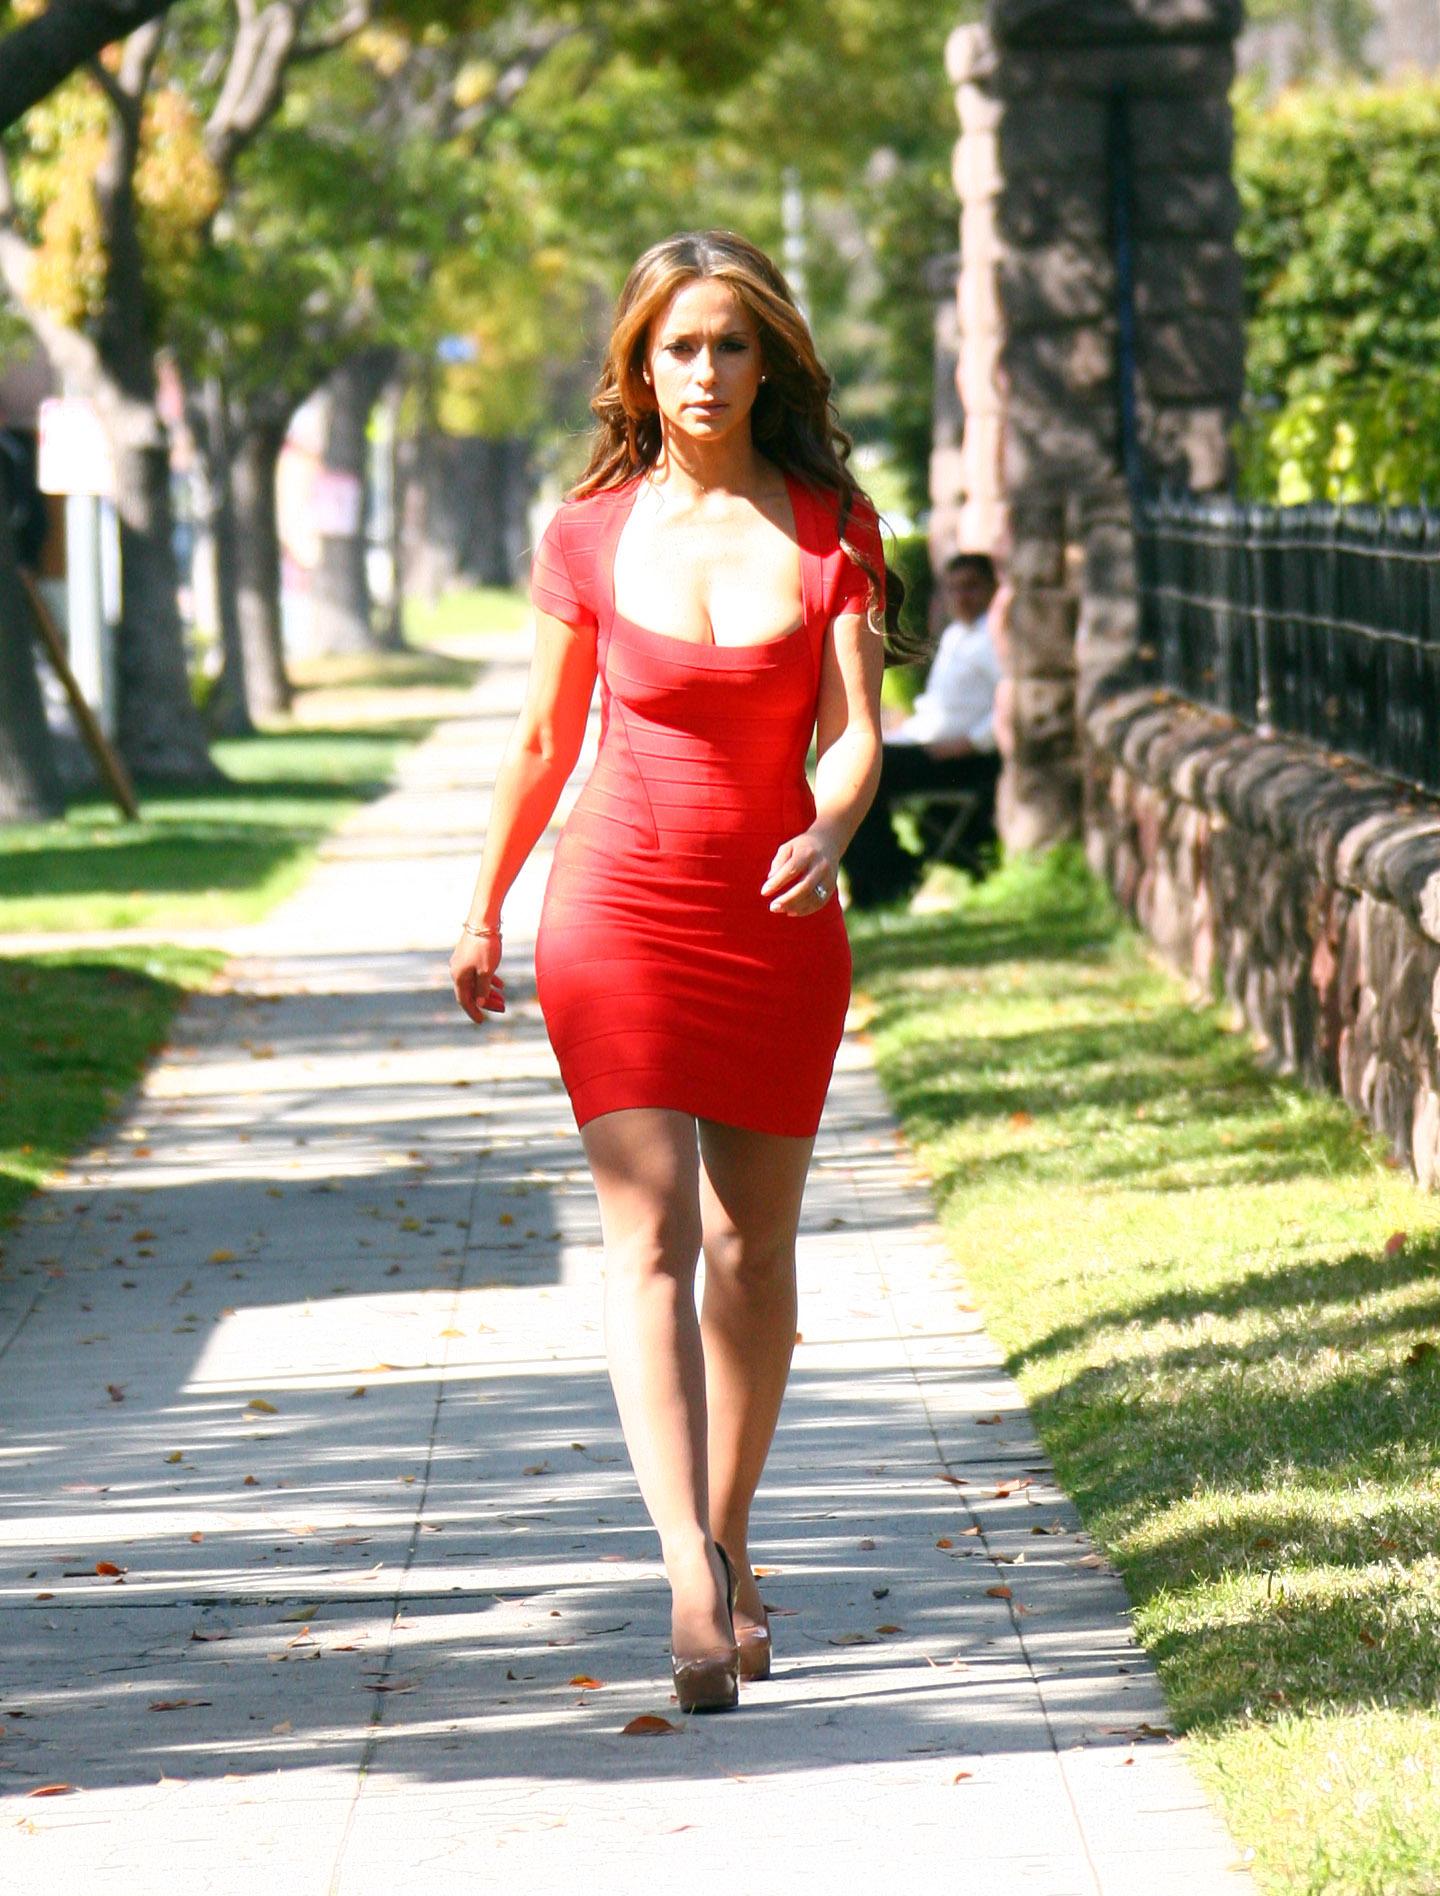 jennifer love hewitt prostitute movie